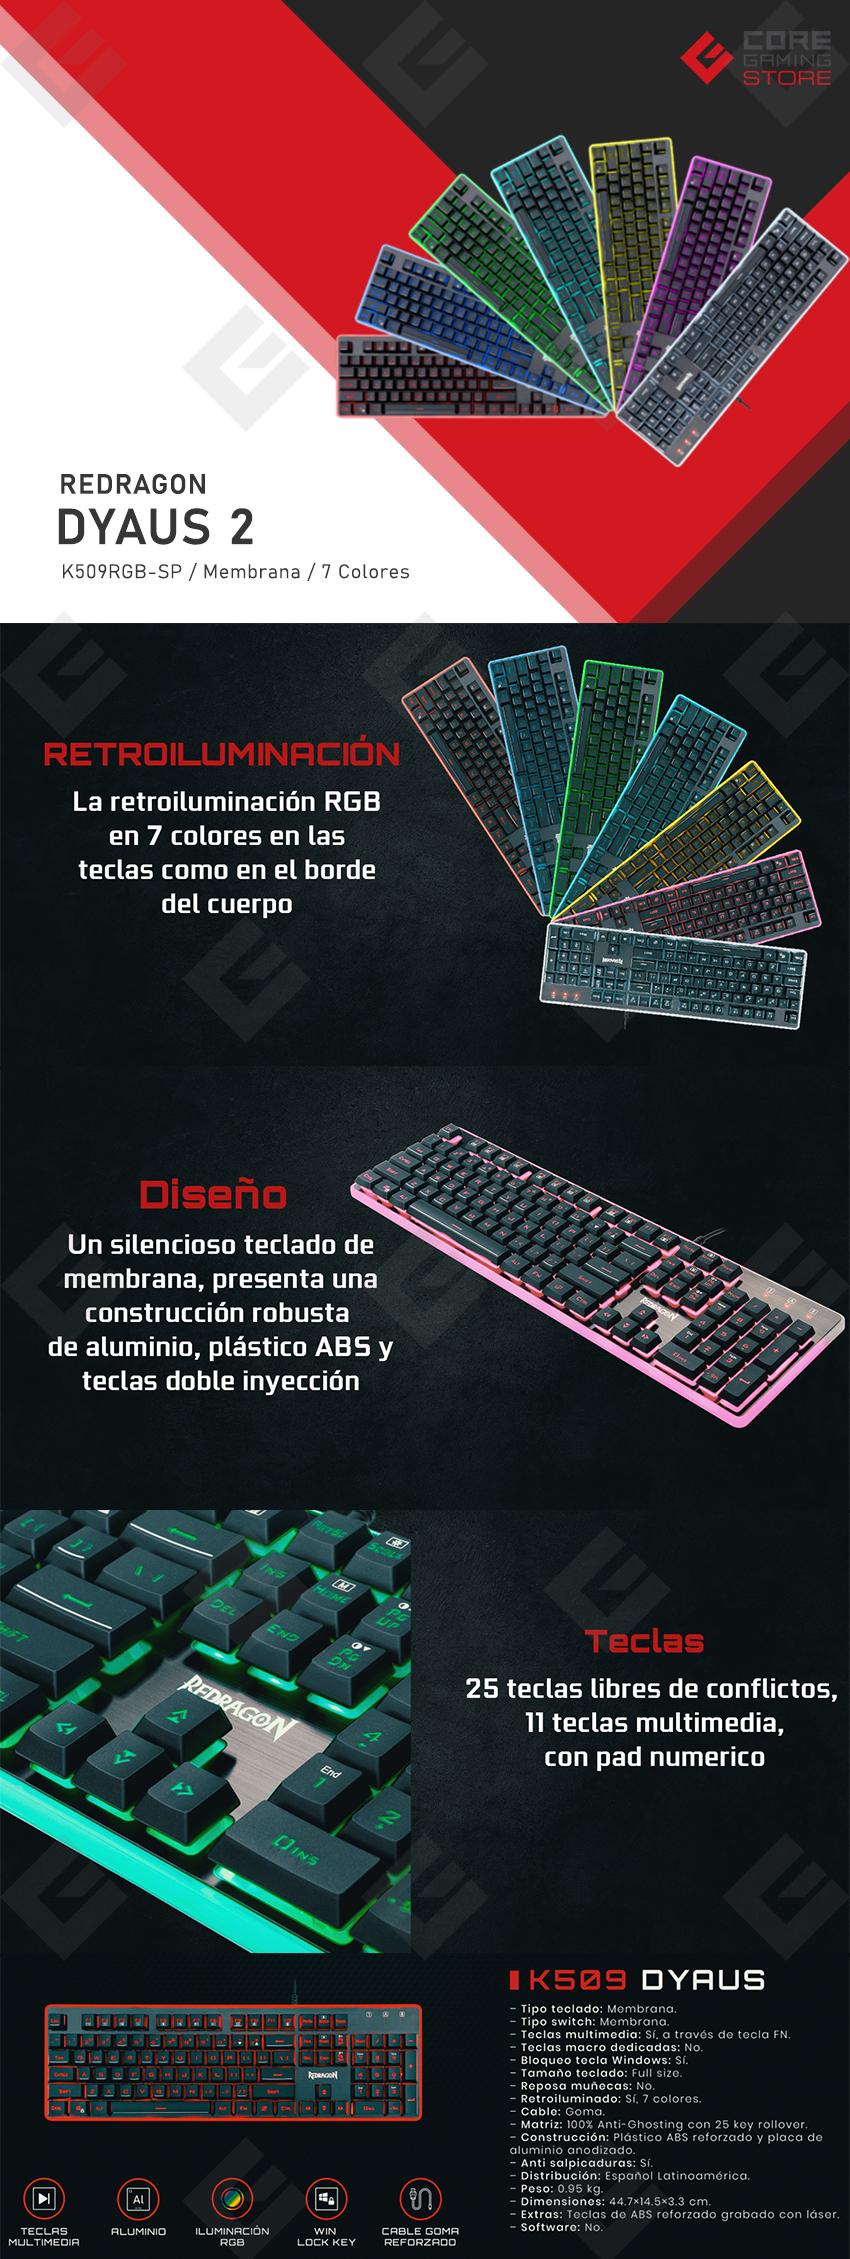 Teclado Membrana Redragon DYAUS2 K509 RGB, 7 Colores, Español - K509RGB-SP